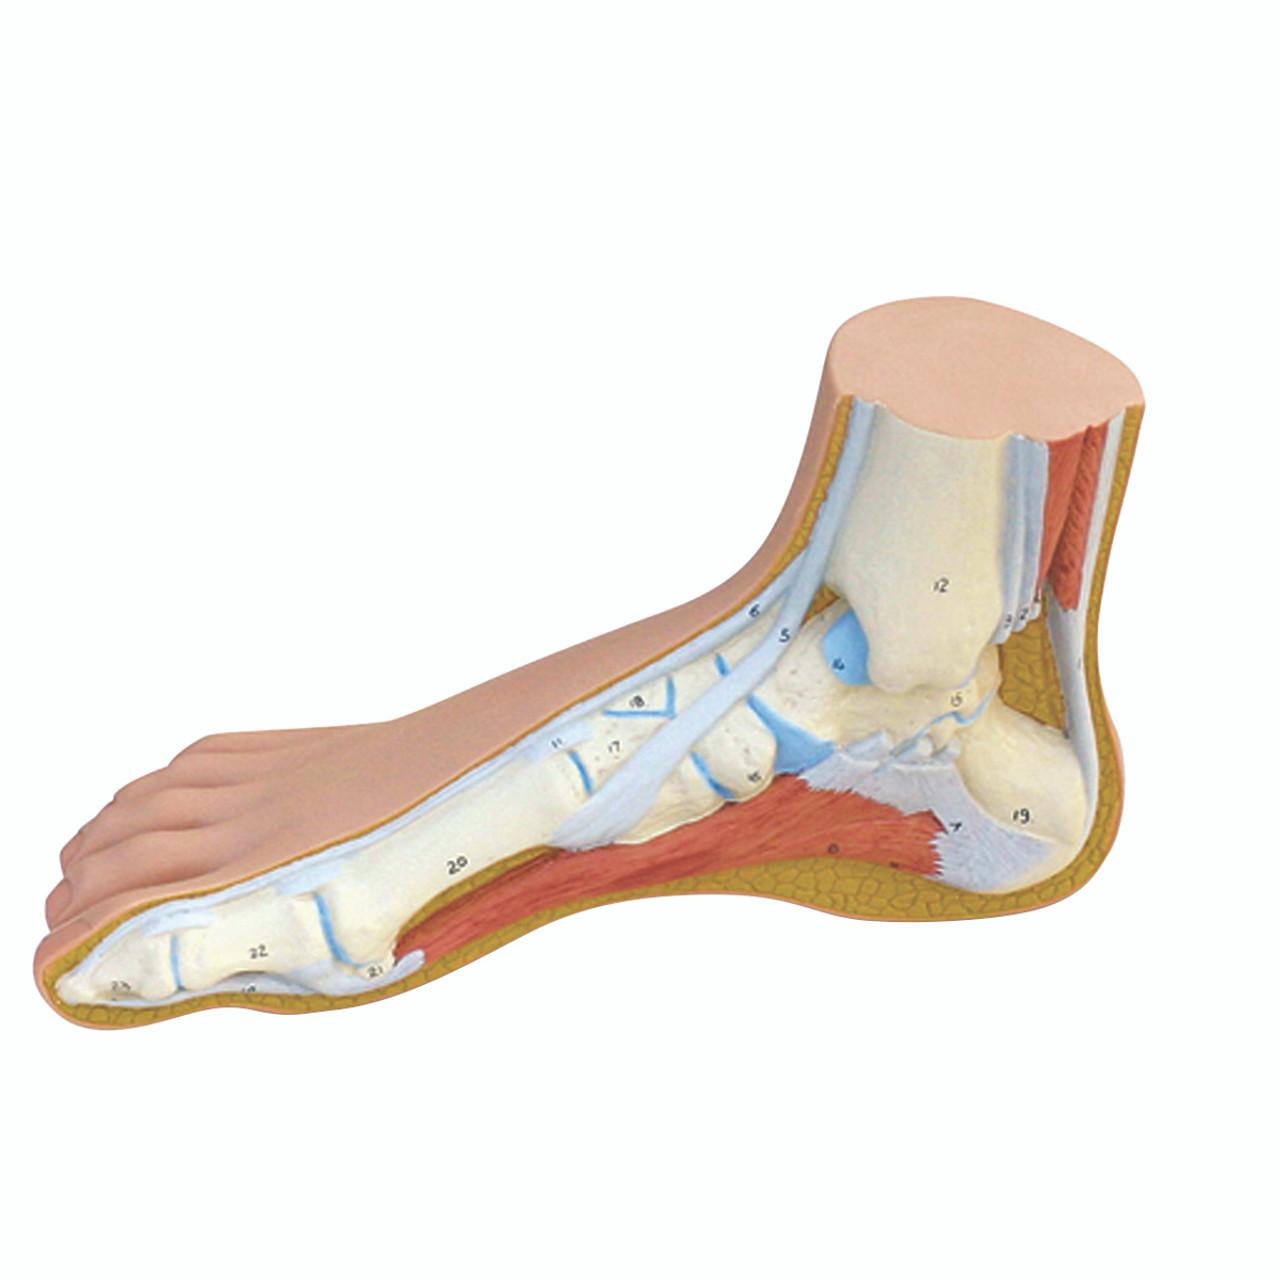 Anatomical Model - Normal Foot